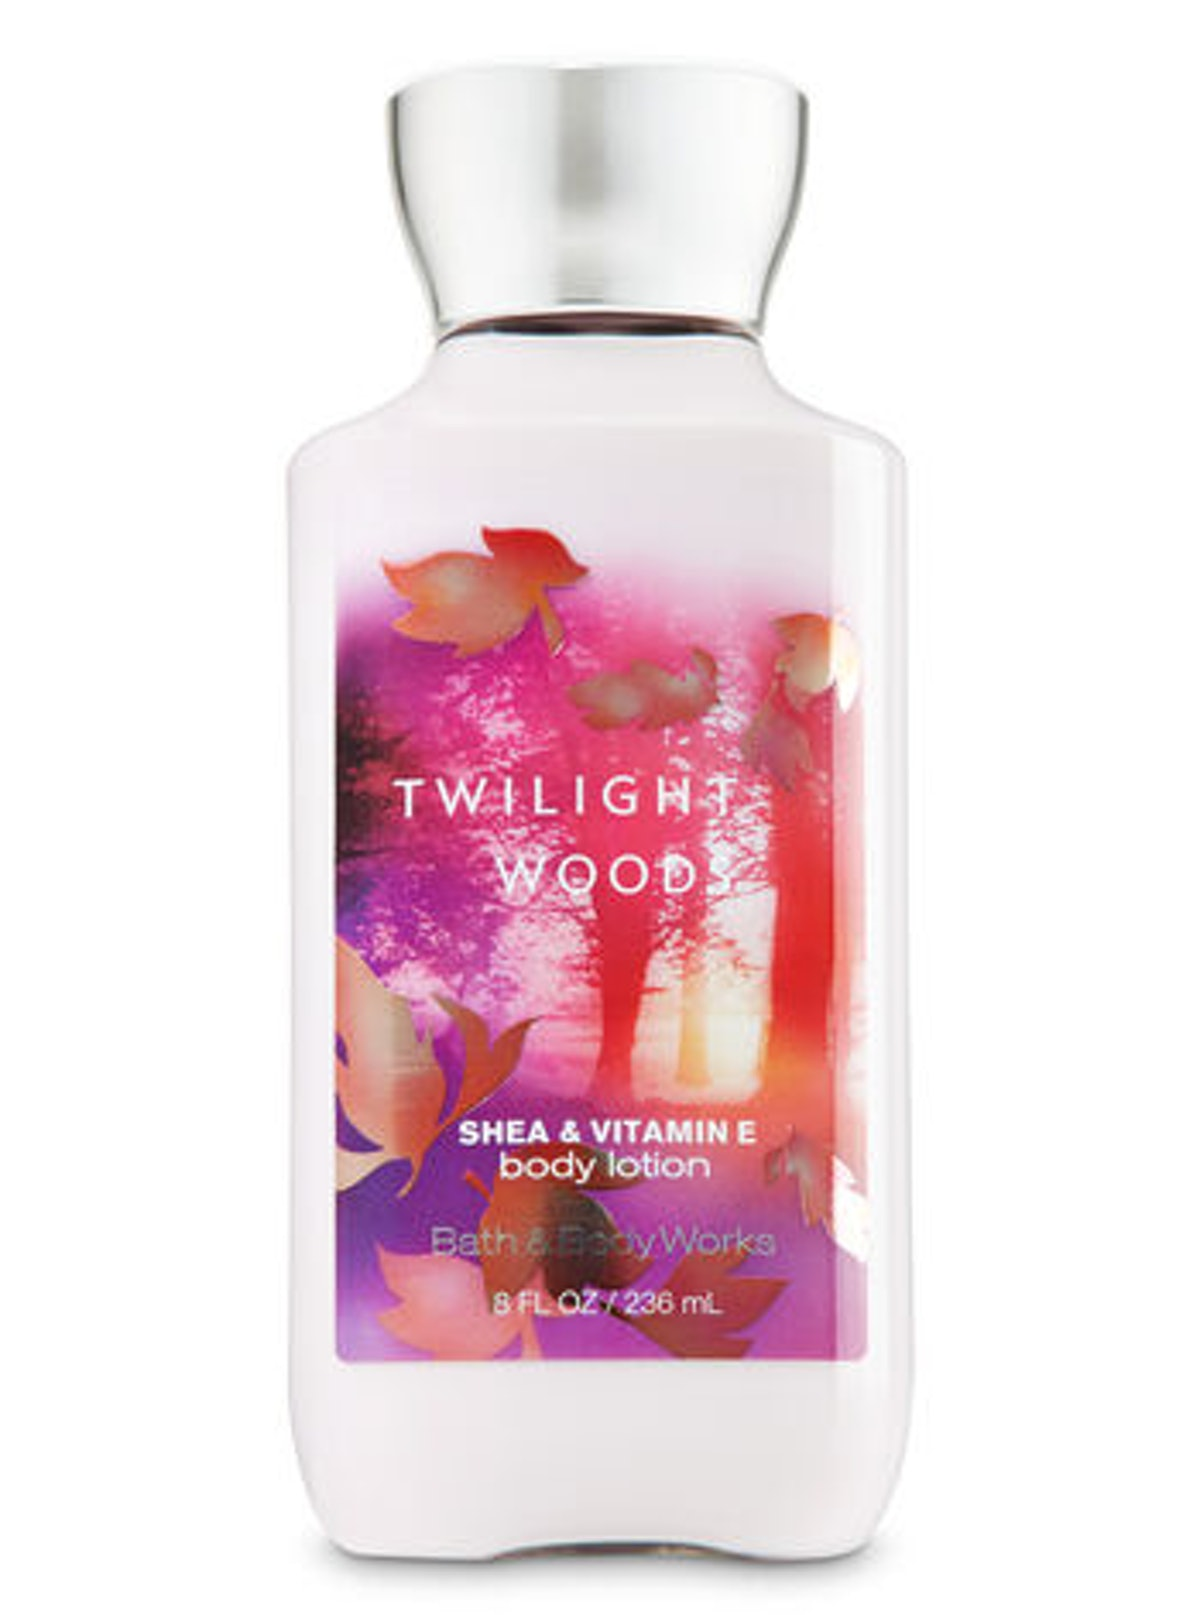 Twilight Woods Body Lotion